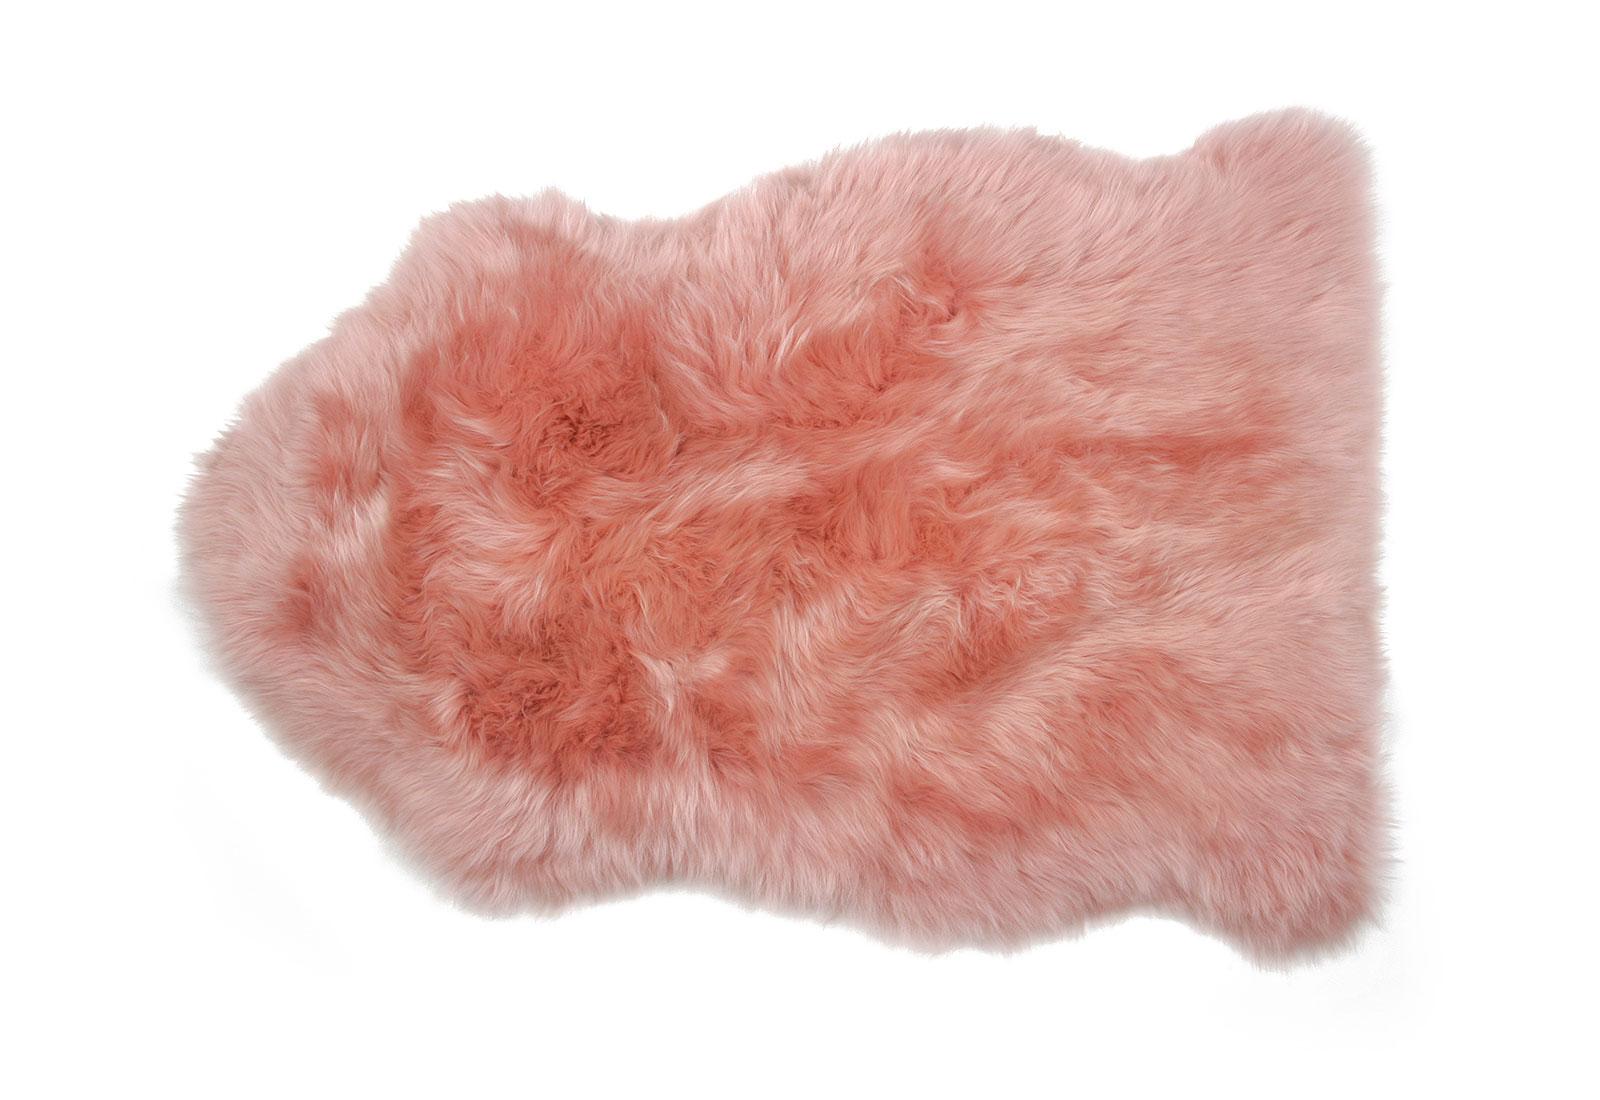 Salmon Pink Sheepskin Rug